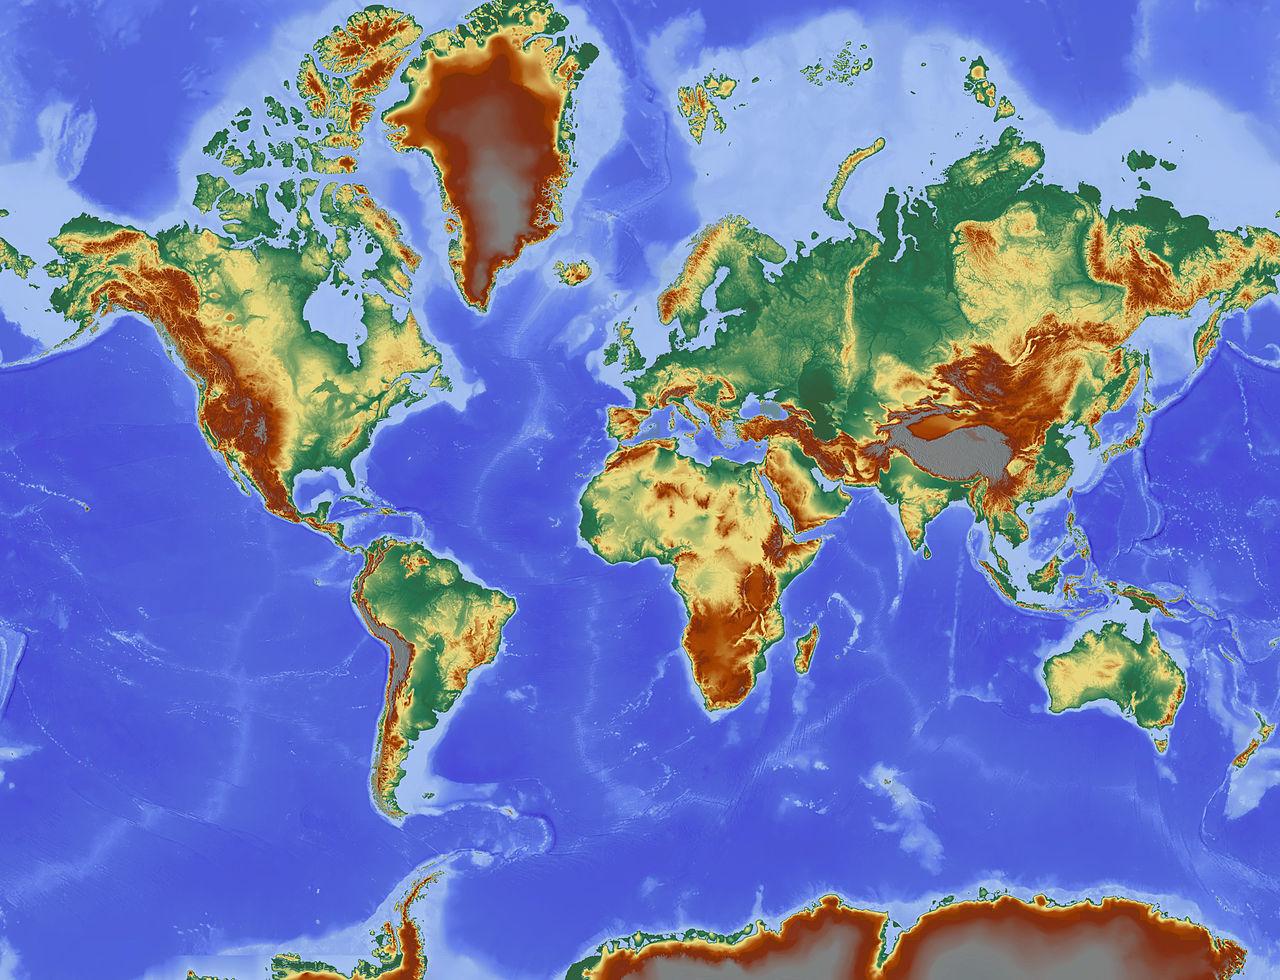 filerelief world map by mapsforfree. filerelief world map by mapsforfree  wikimedia commons